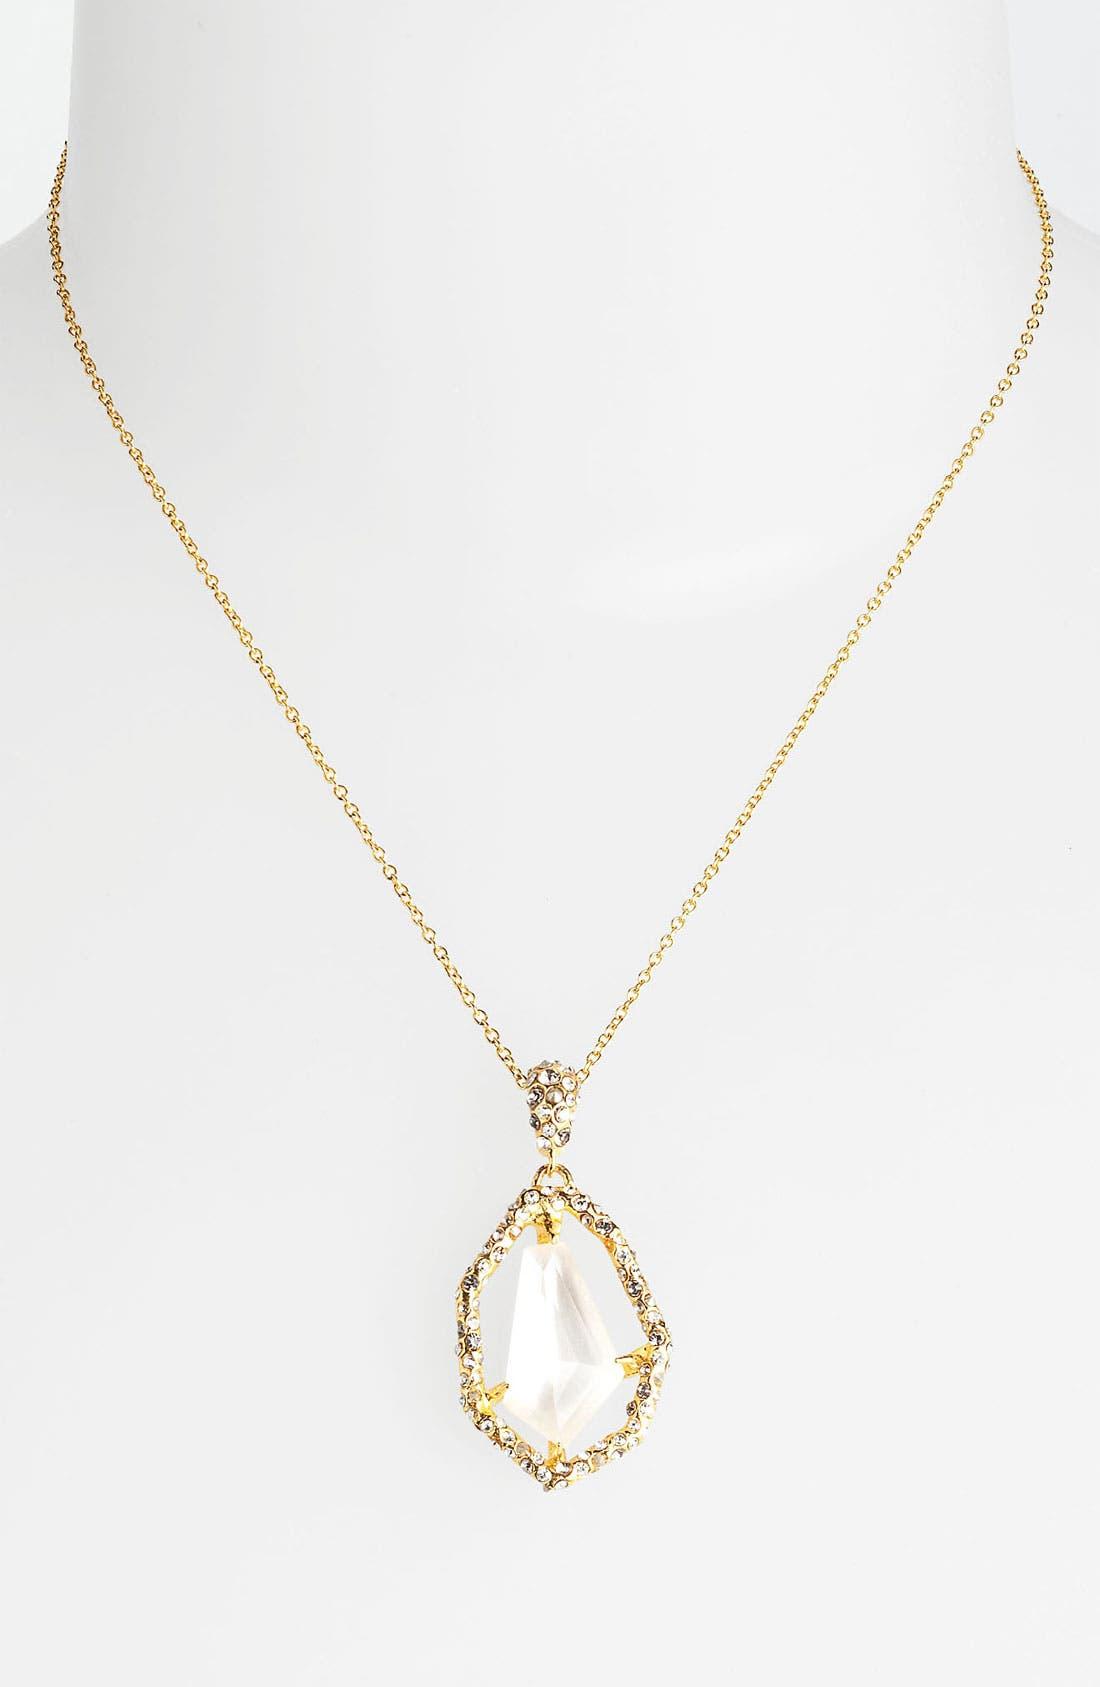 Main Image - Alexis Bittar 'Miss Havisham - Bel Air' Pendant Necklace